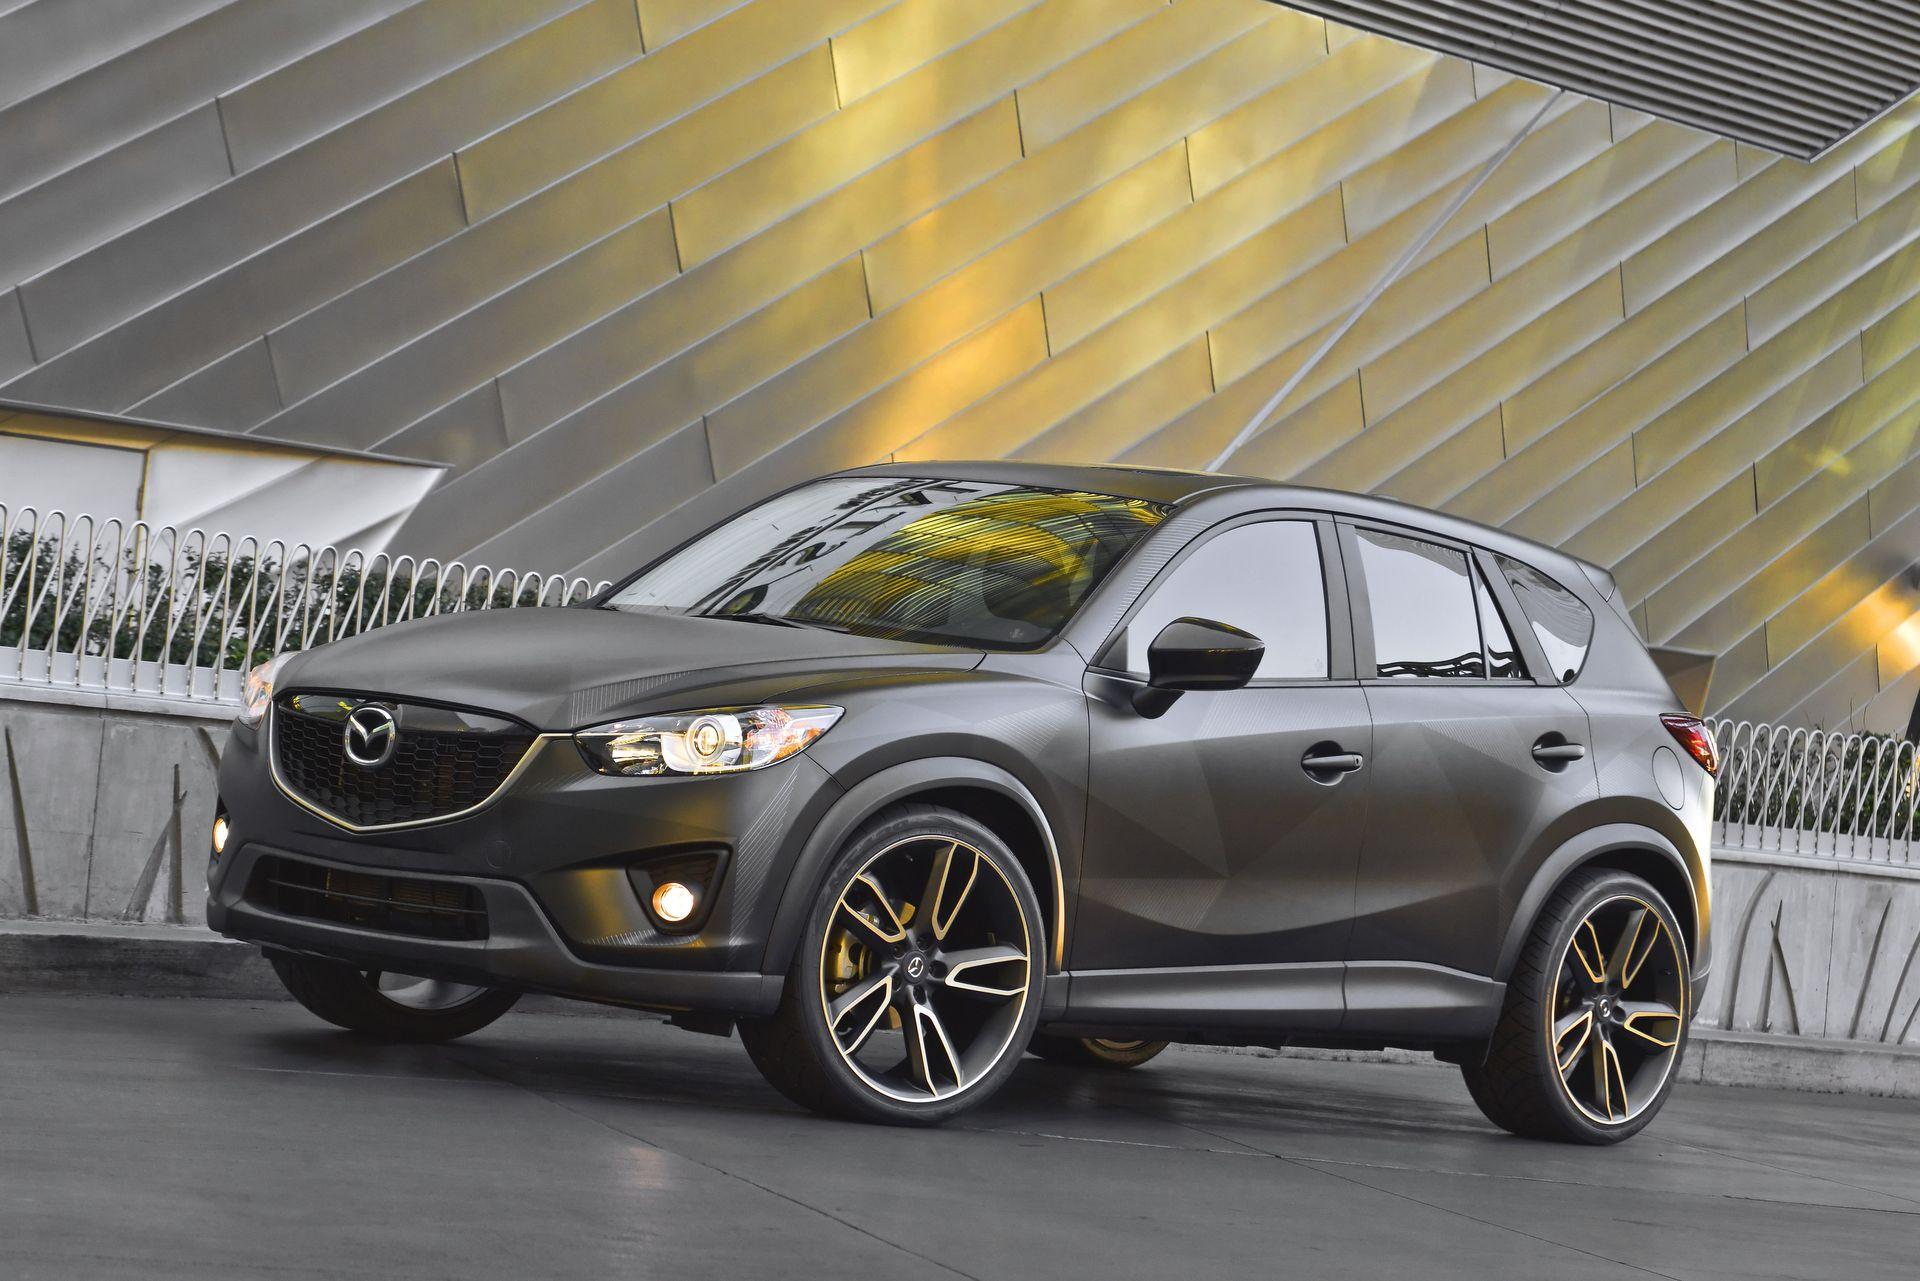 2013 Mazda 6 22 Inch Wheels